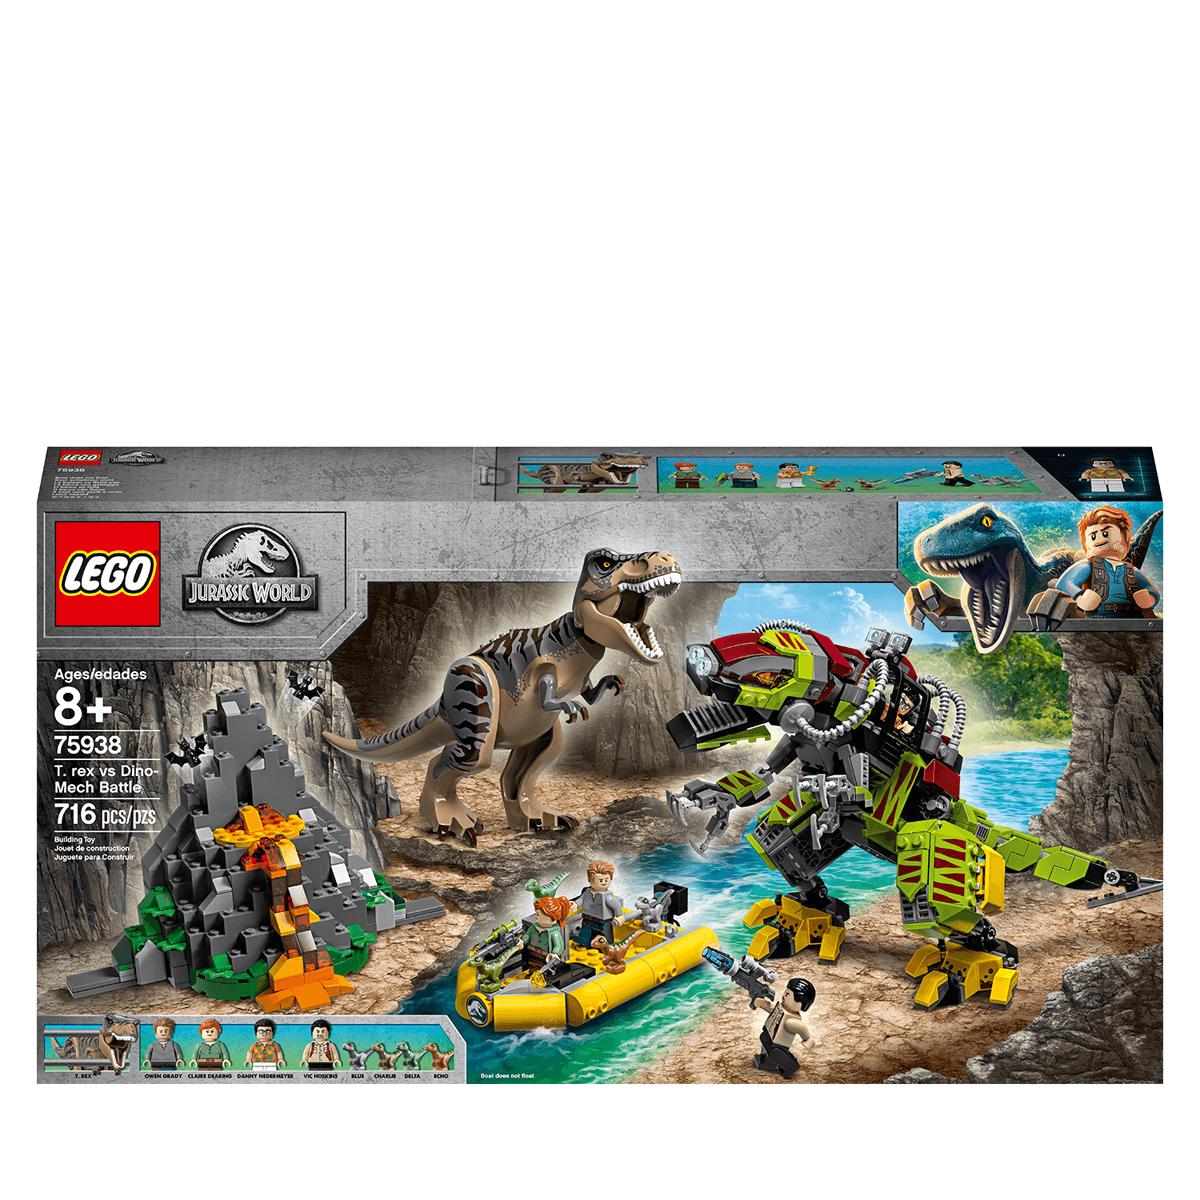 World Battle Jurassic Vs Lego 75938 Dino TRex Mech dtrhQCs